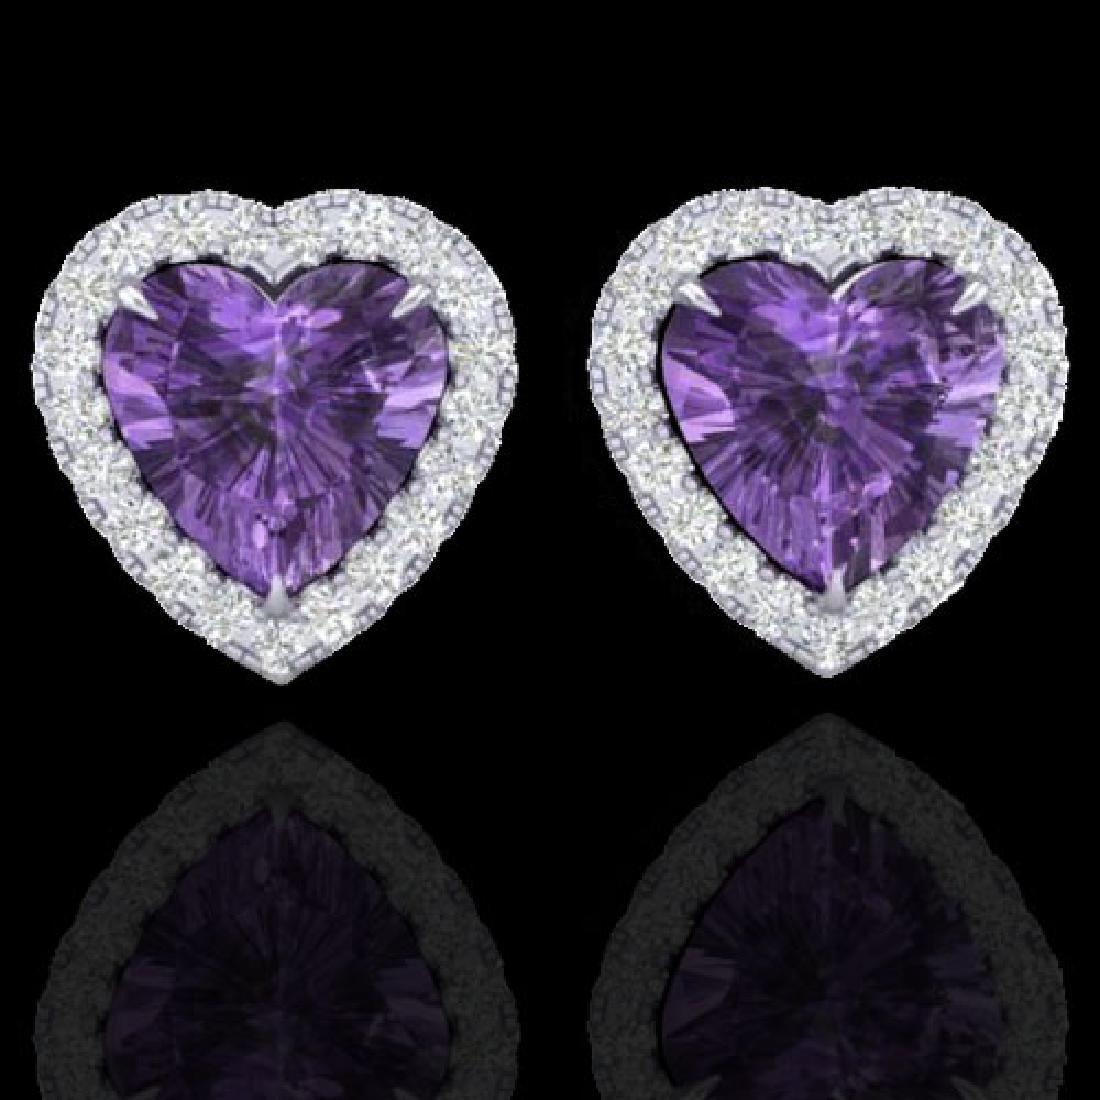 2 CTW Amethyst & Micro Pave VS/SI Diamond Earrings